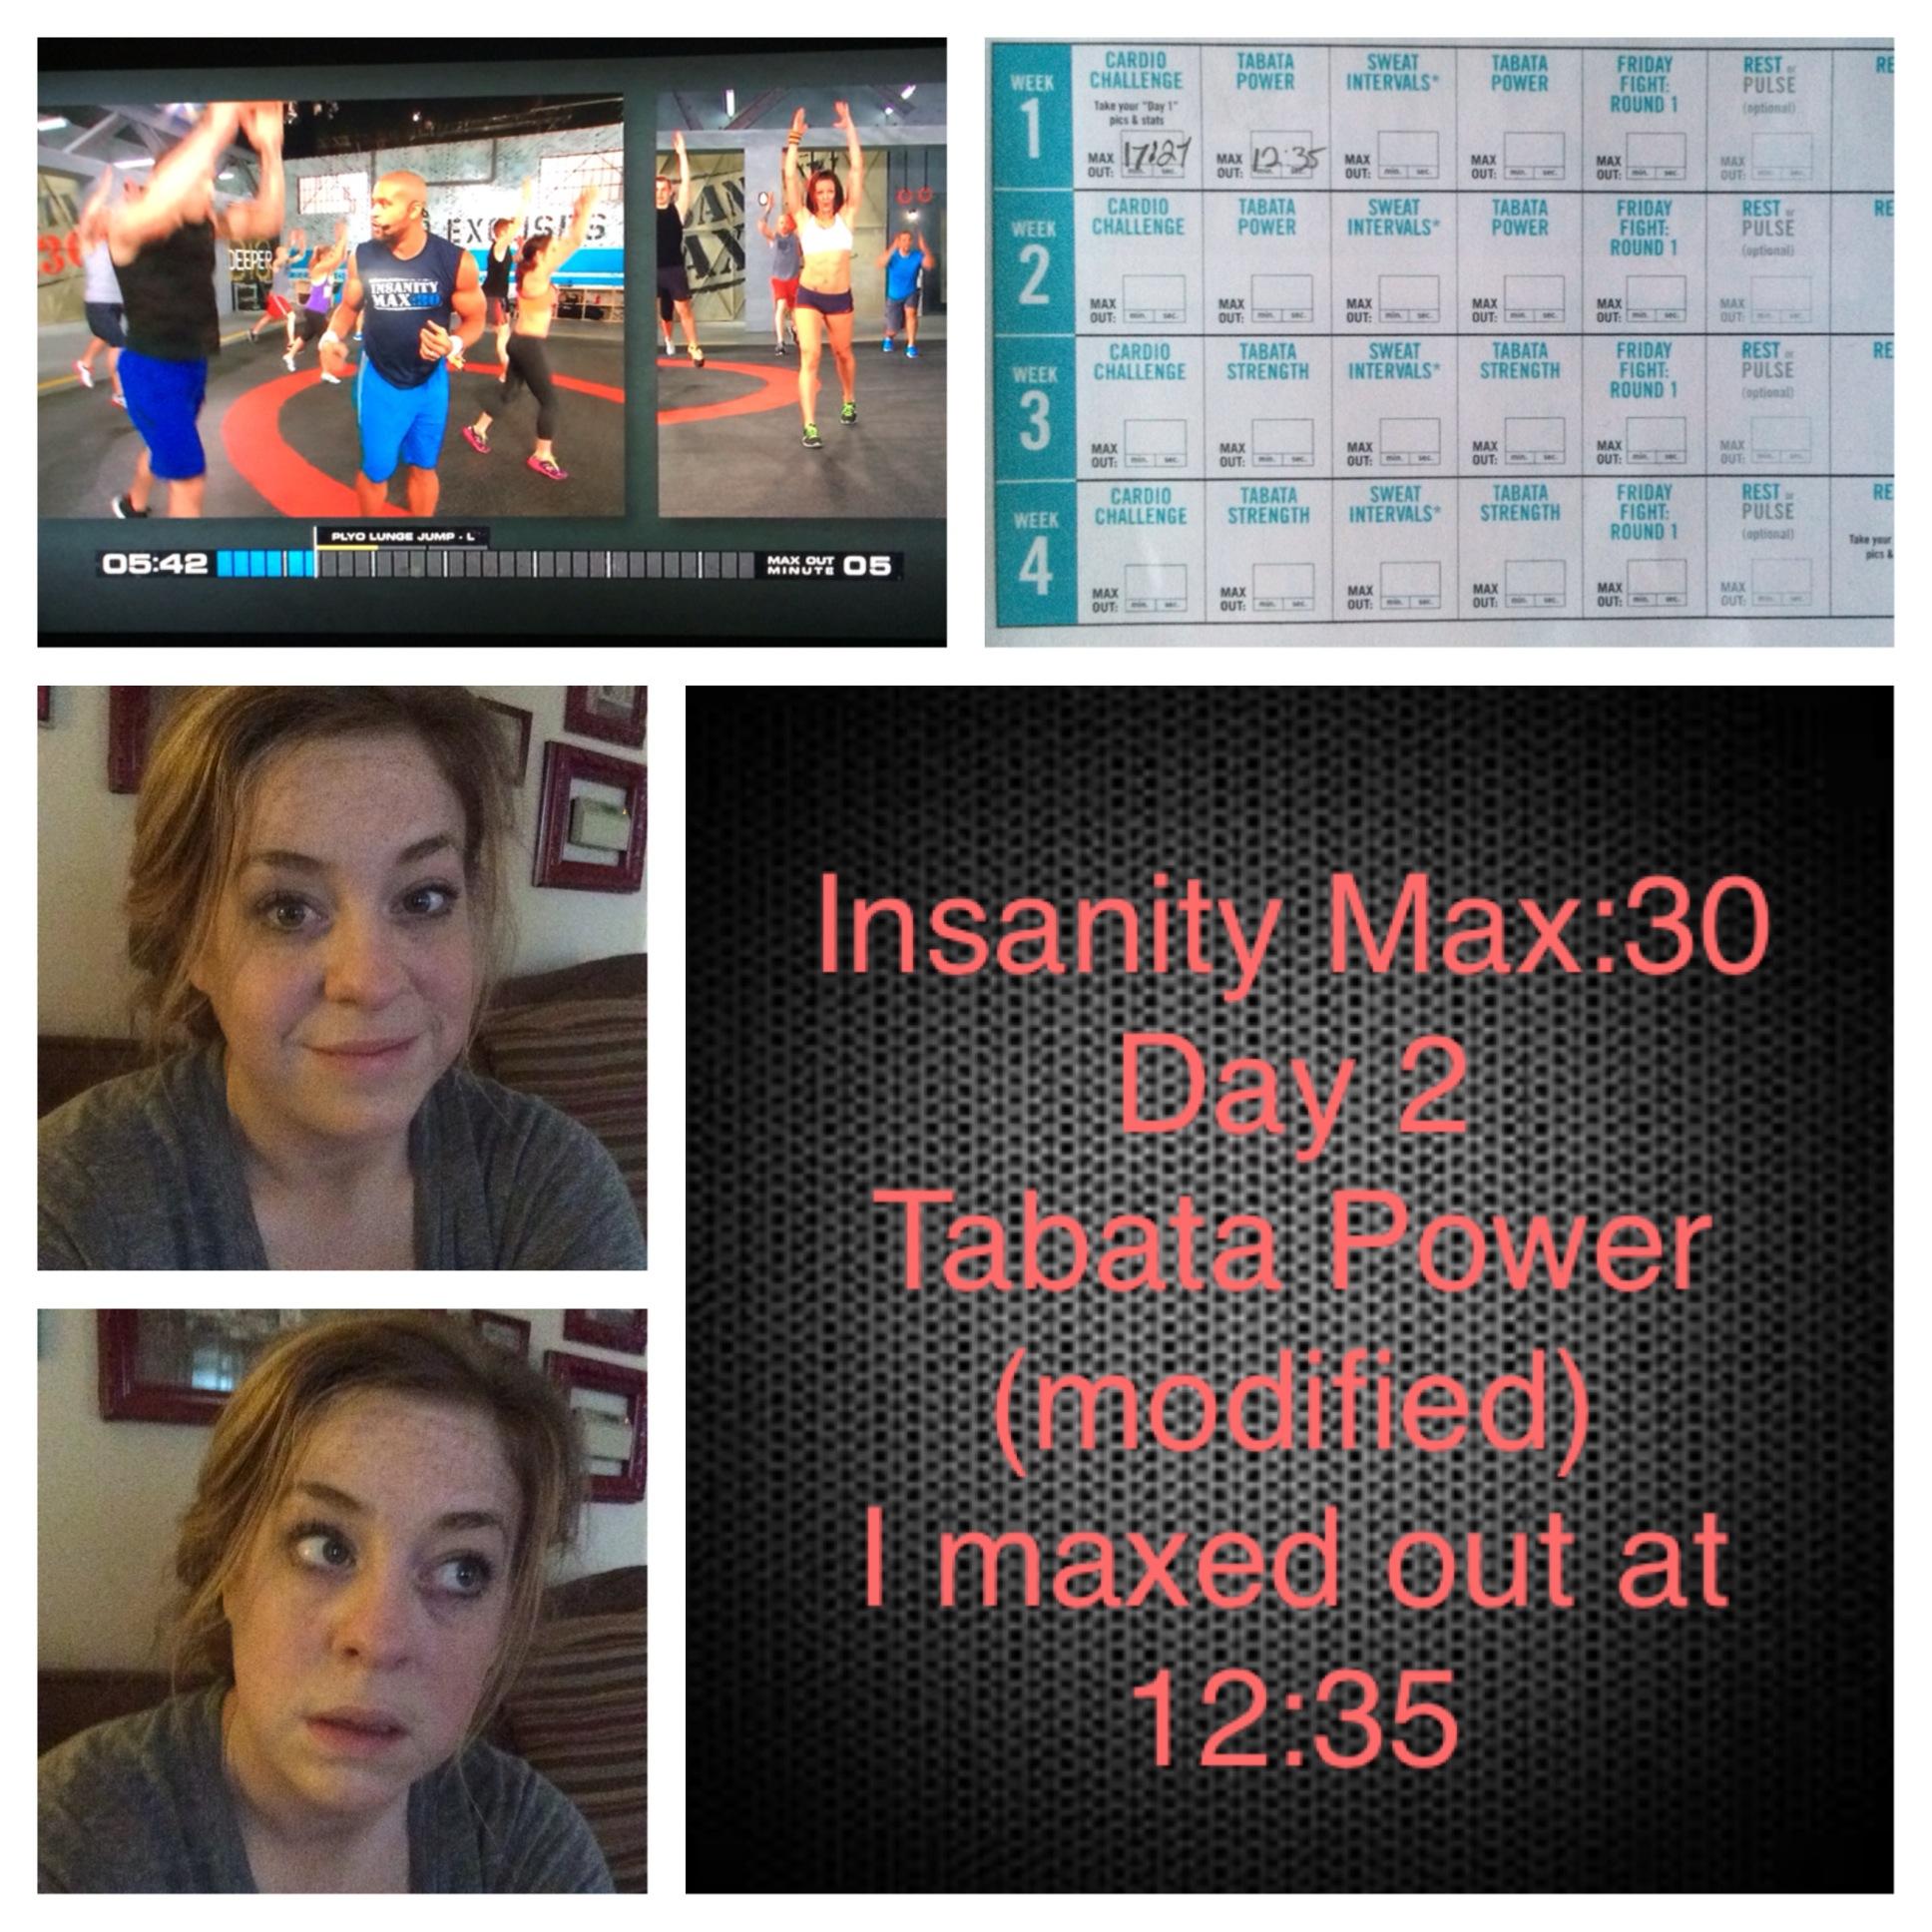 Insanity Max:30 Week 1, Modified   Lifestylist Fitness